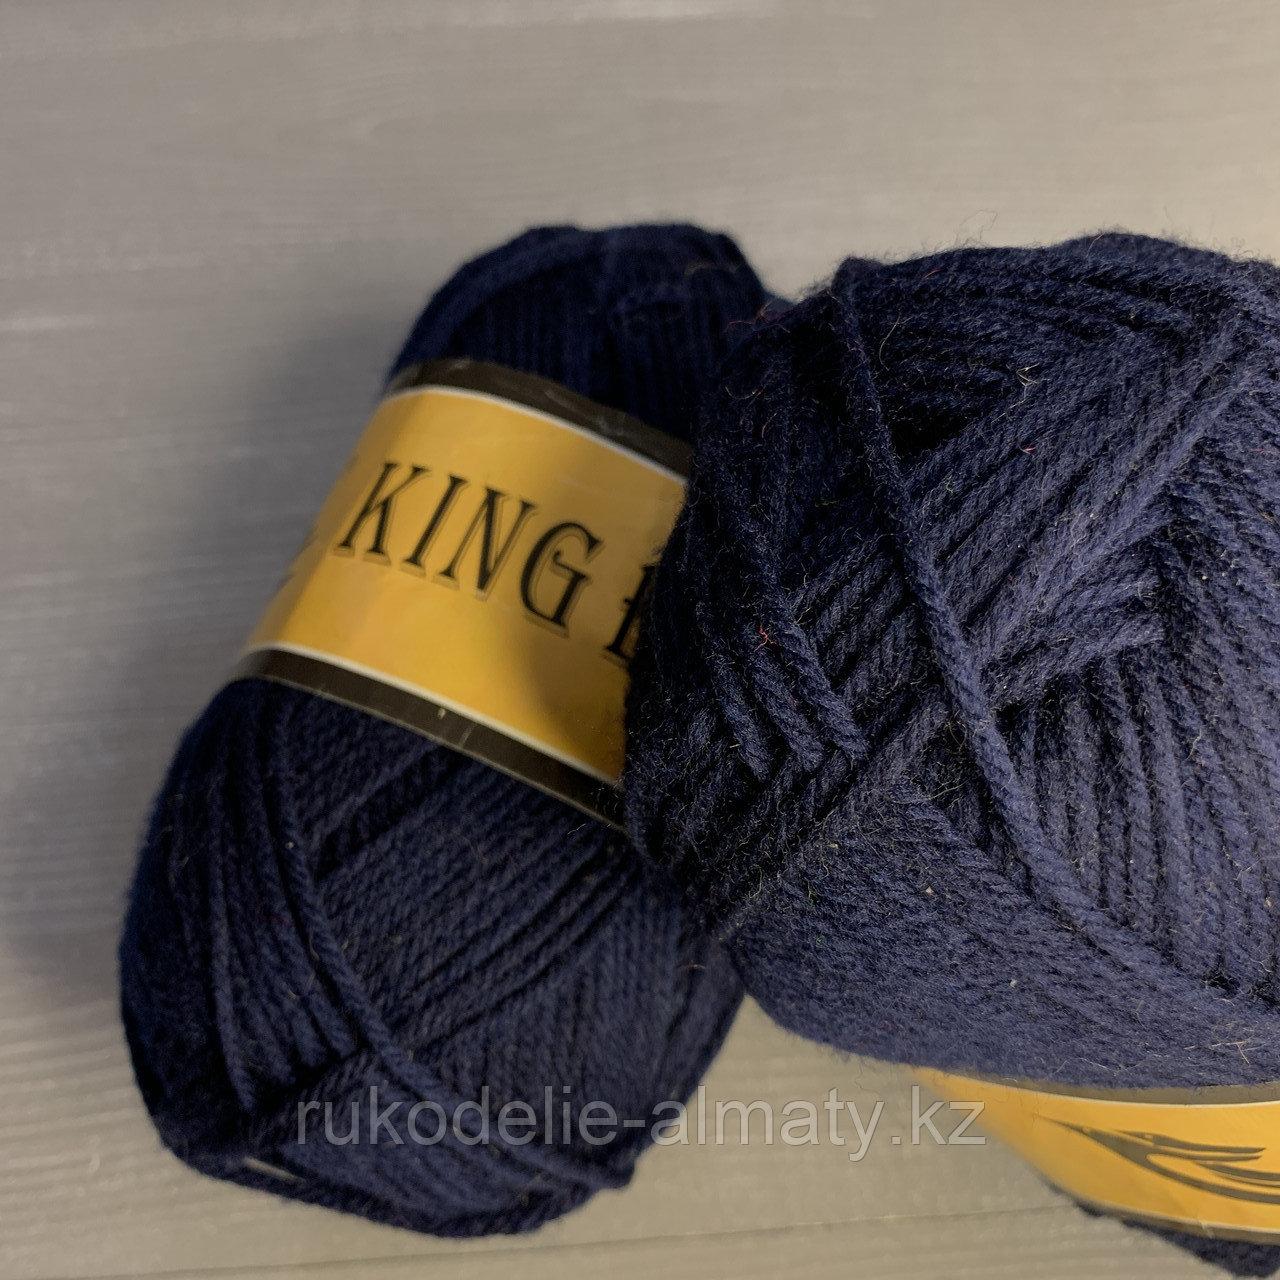 Пряжа акриловая премиум-класса King Bird темно-синий - фото 2